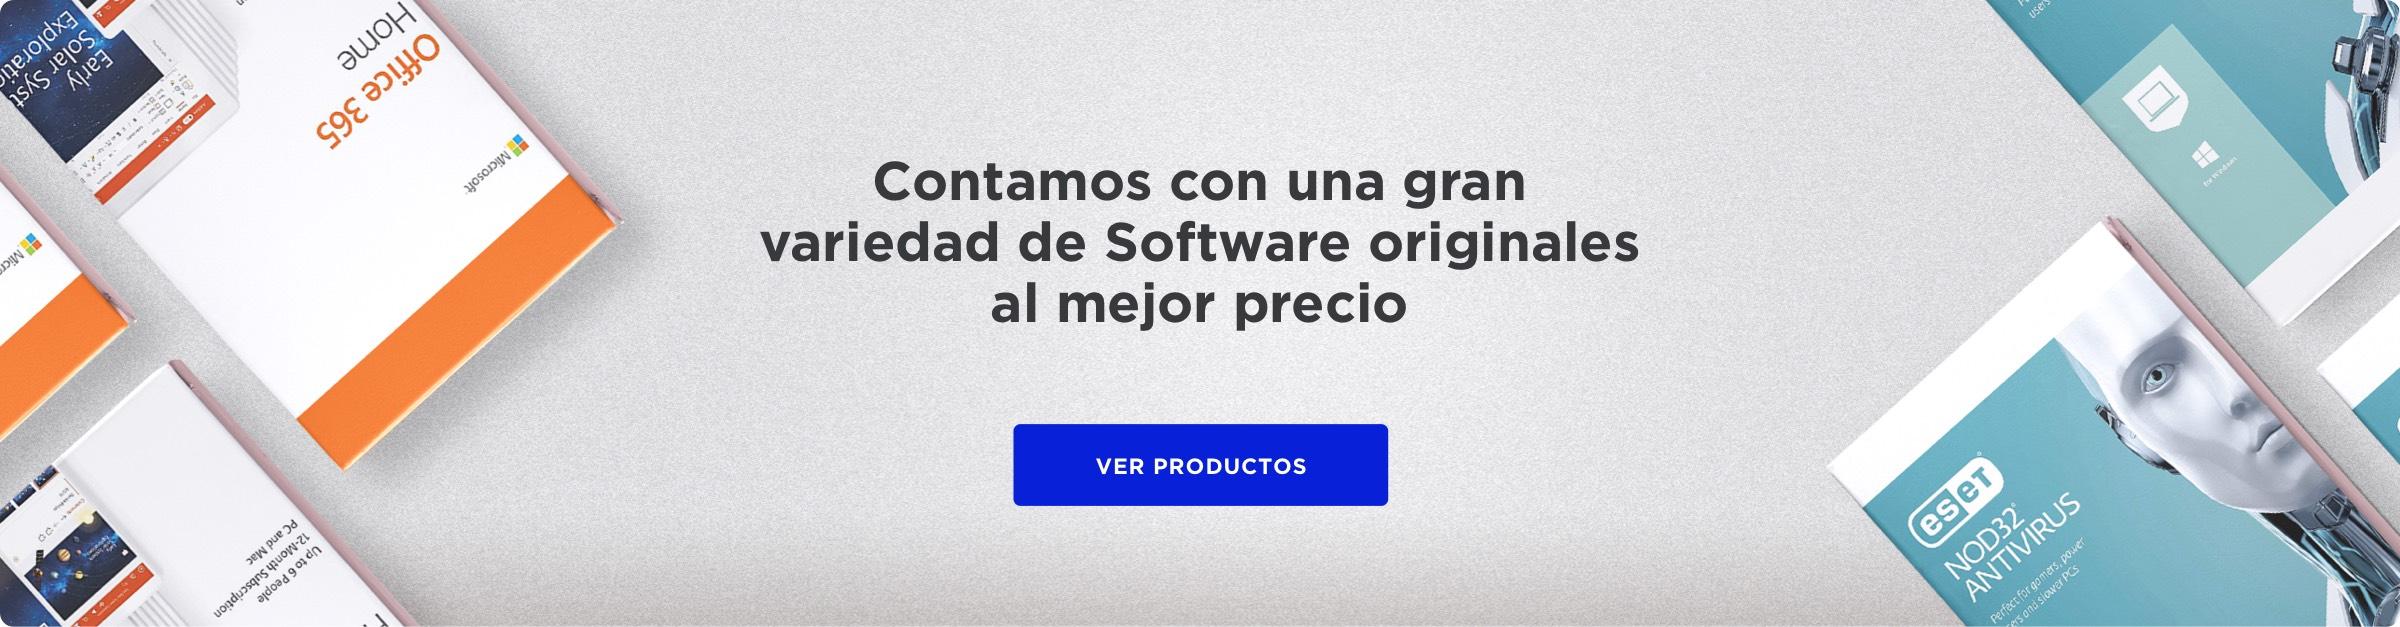 Home - banner software - R&M Portátiles